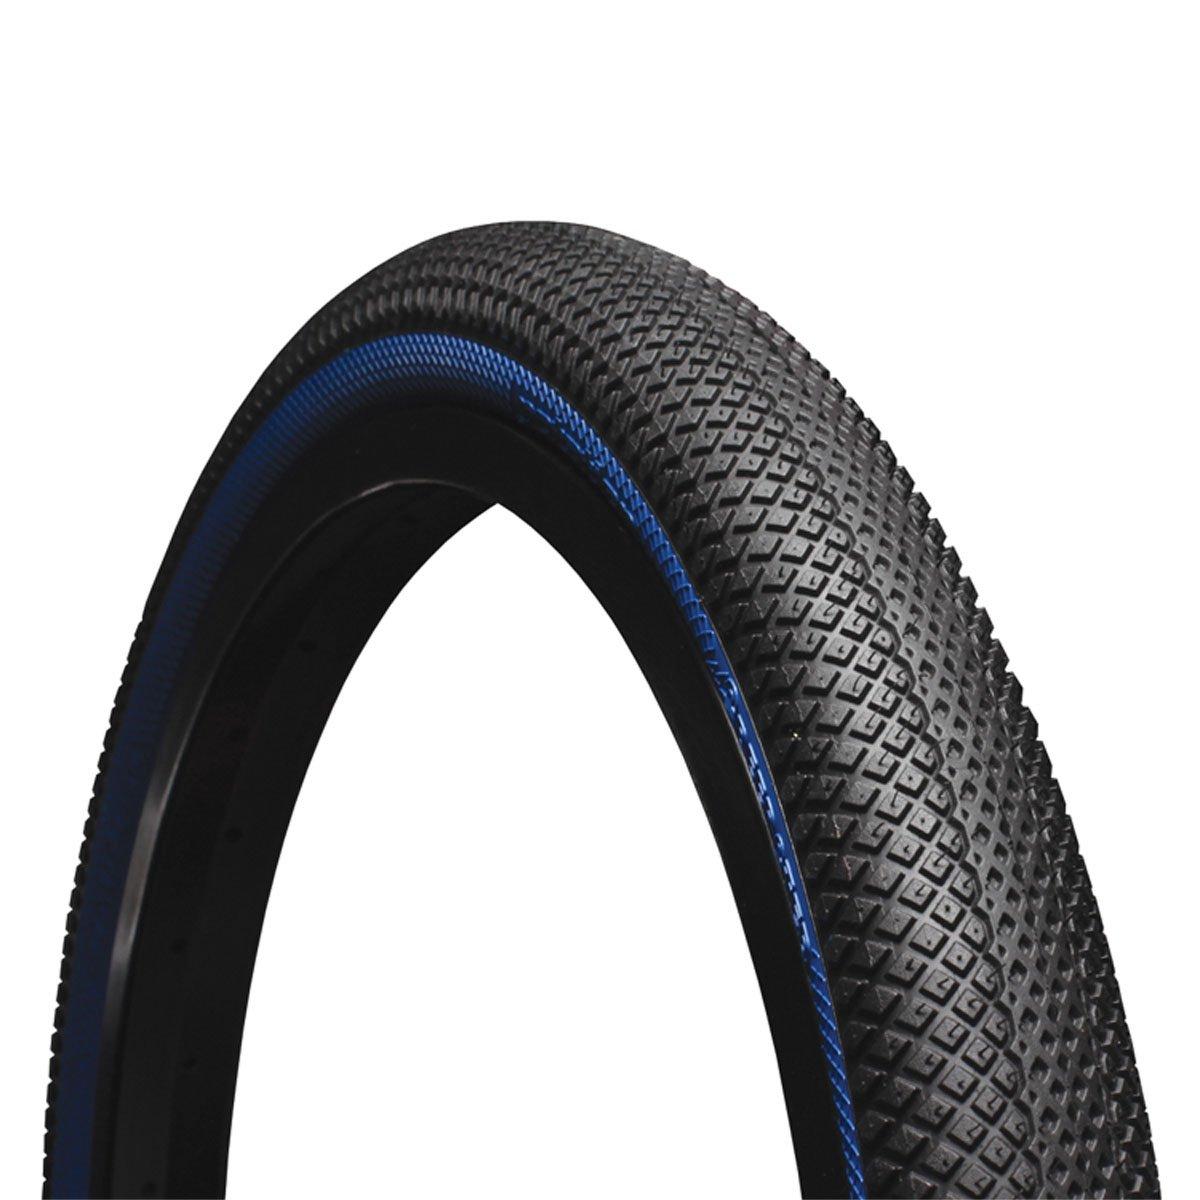 Vee Rubber Speedster Folding Black 26 X 3.50